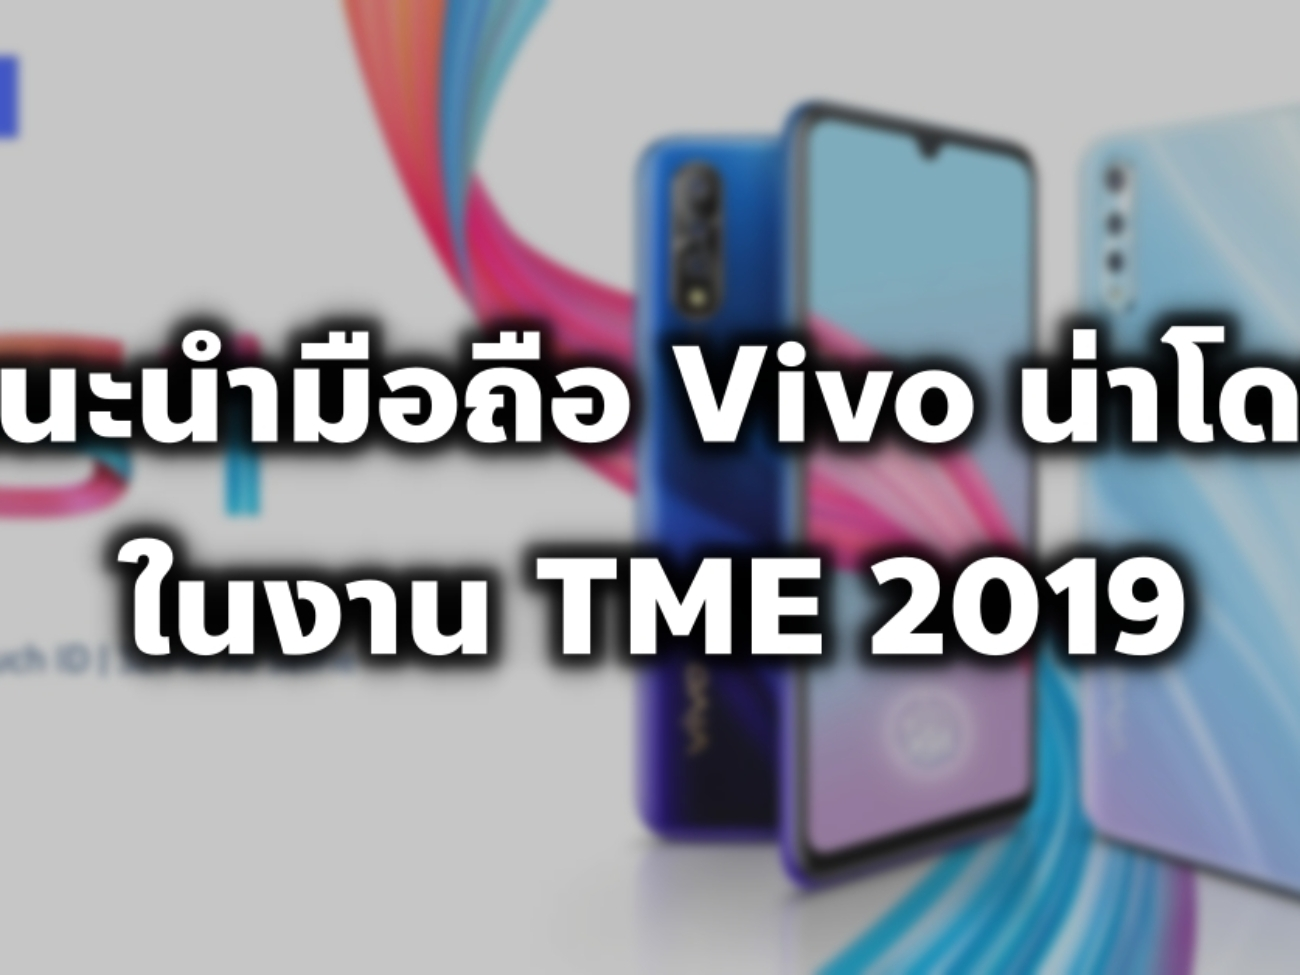 Vivo-S1-design-confirmed-v1